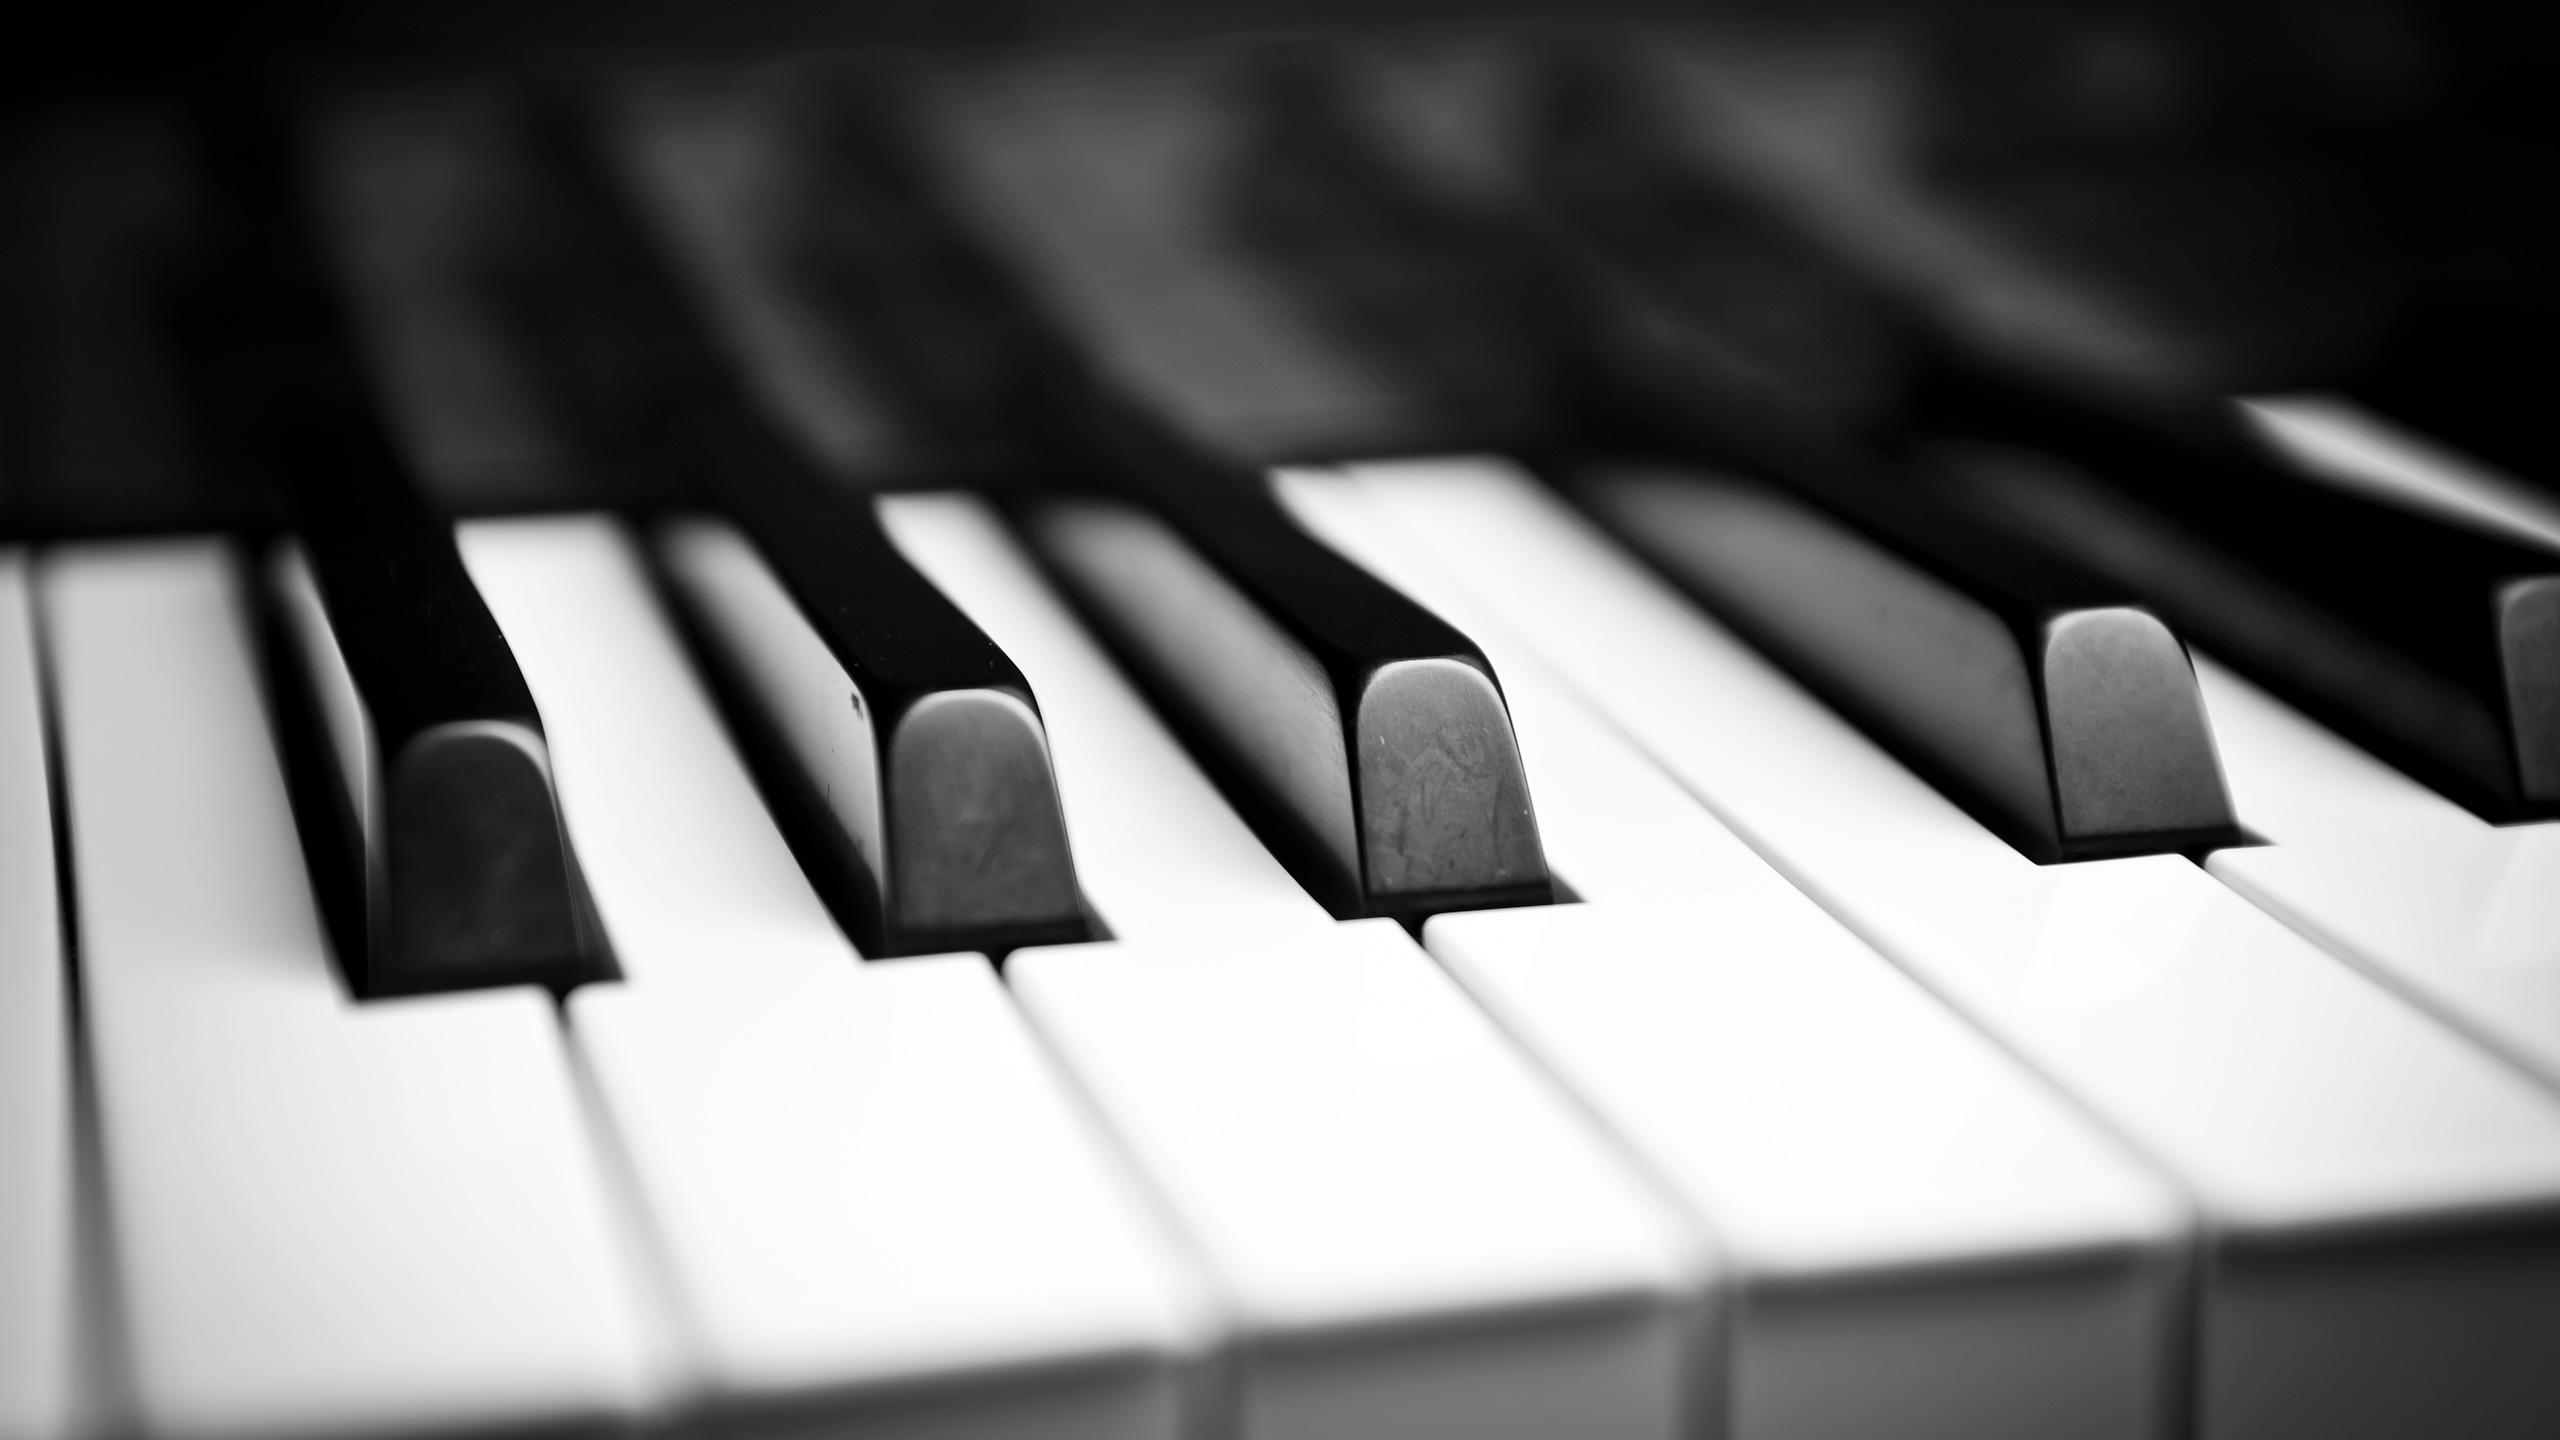 Black & White Close-up Photo of Piano Keys